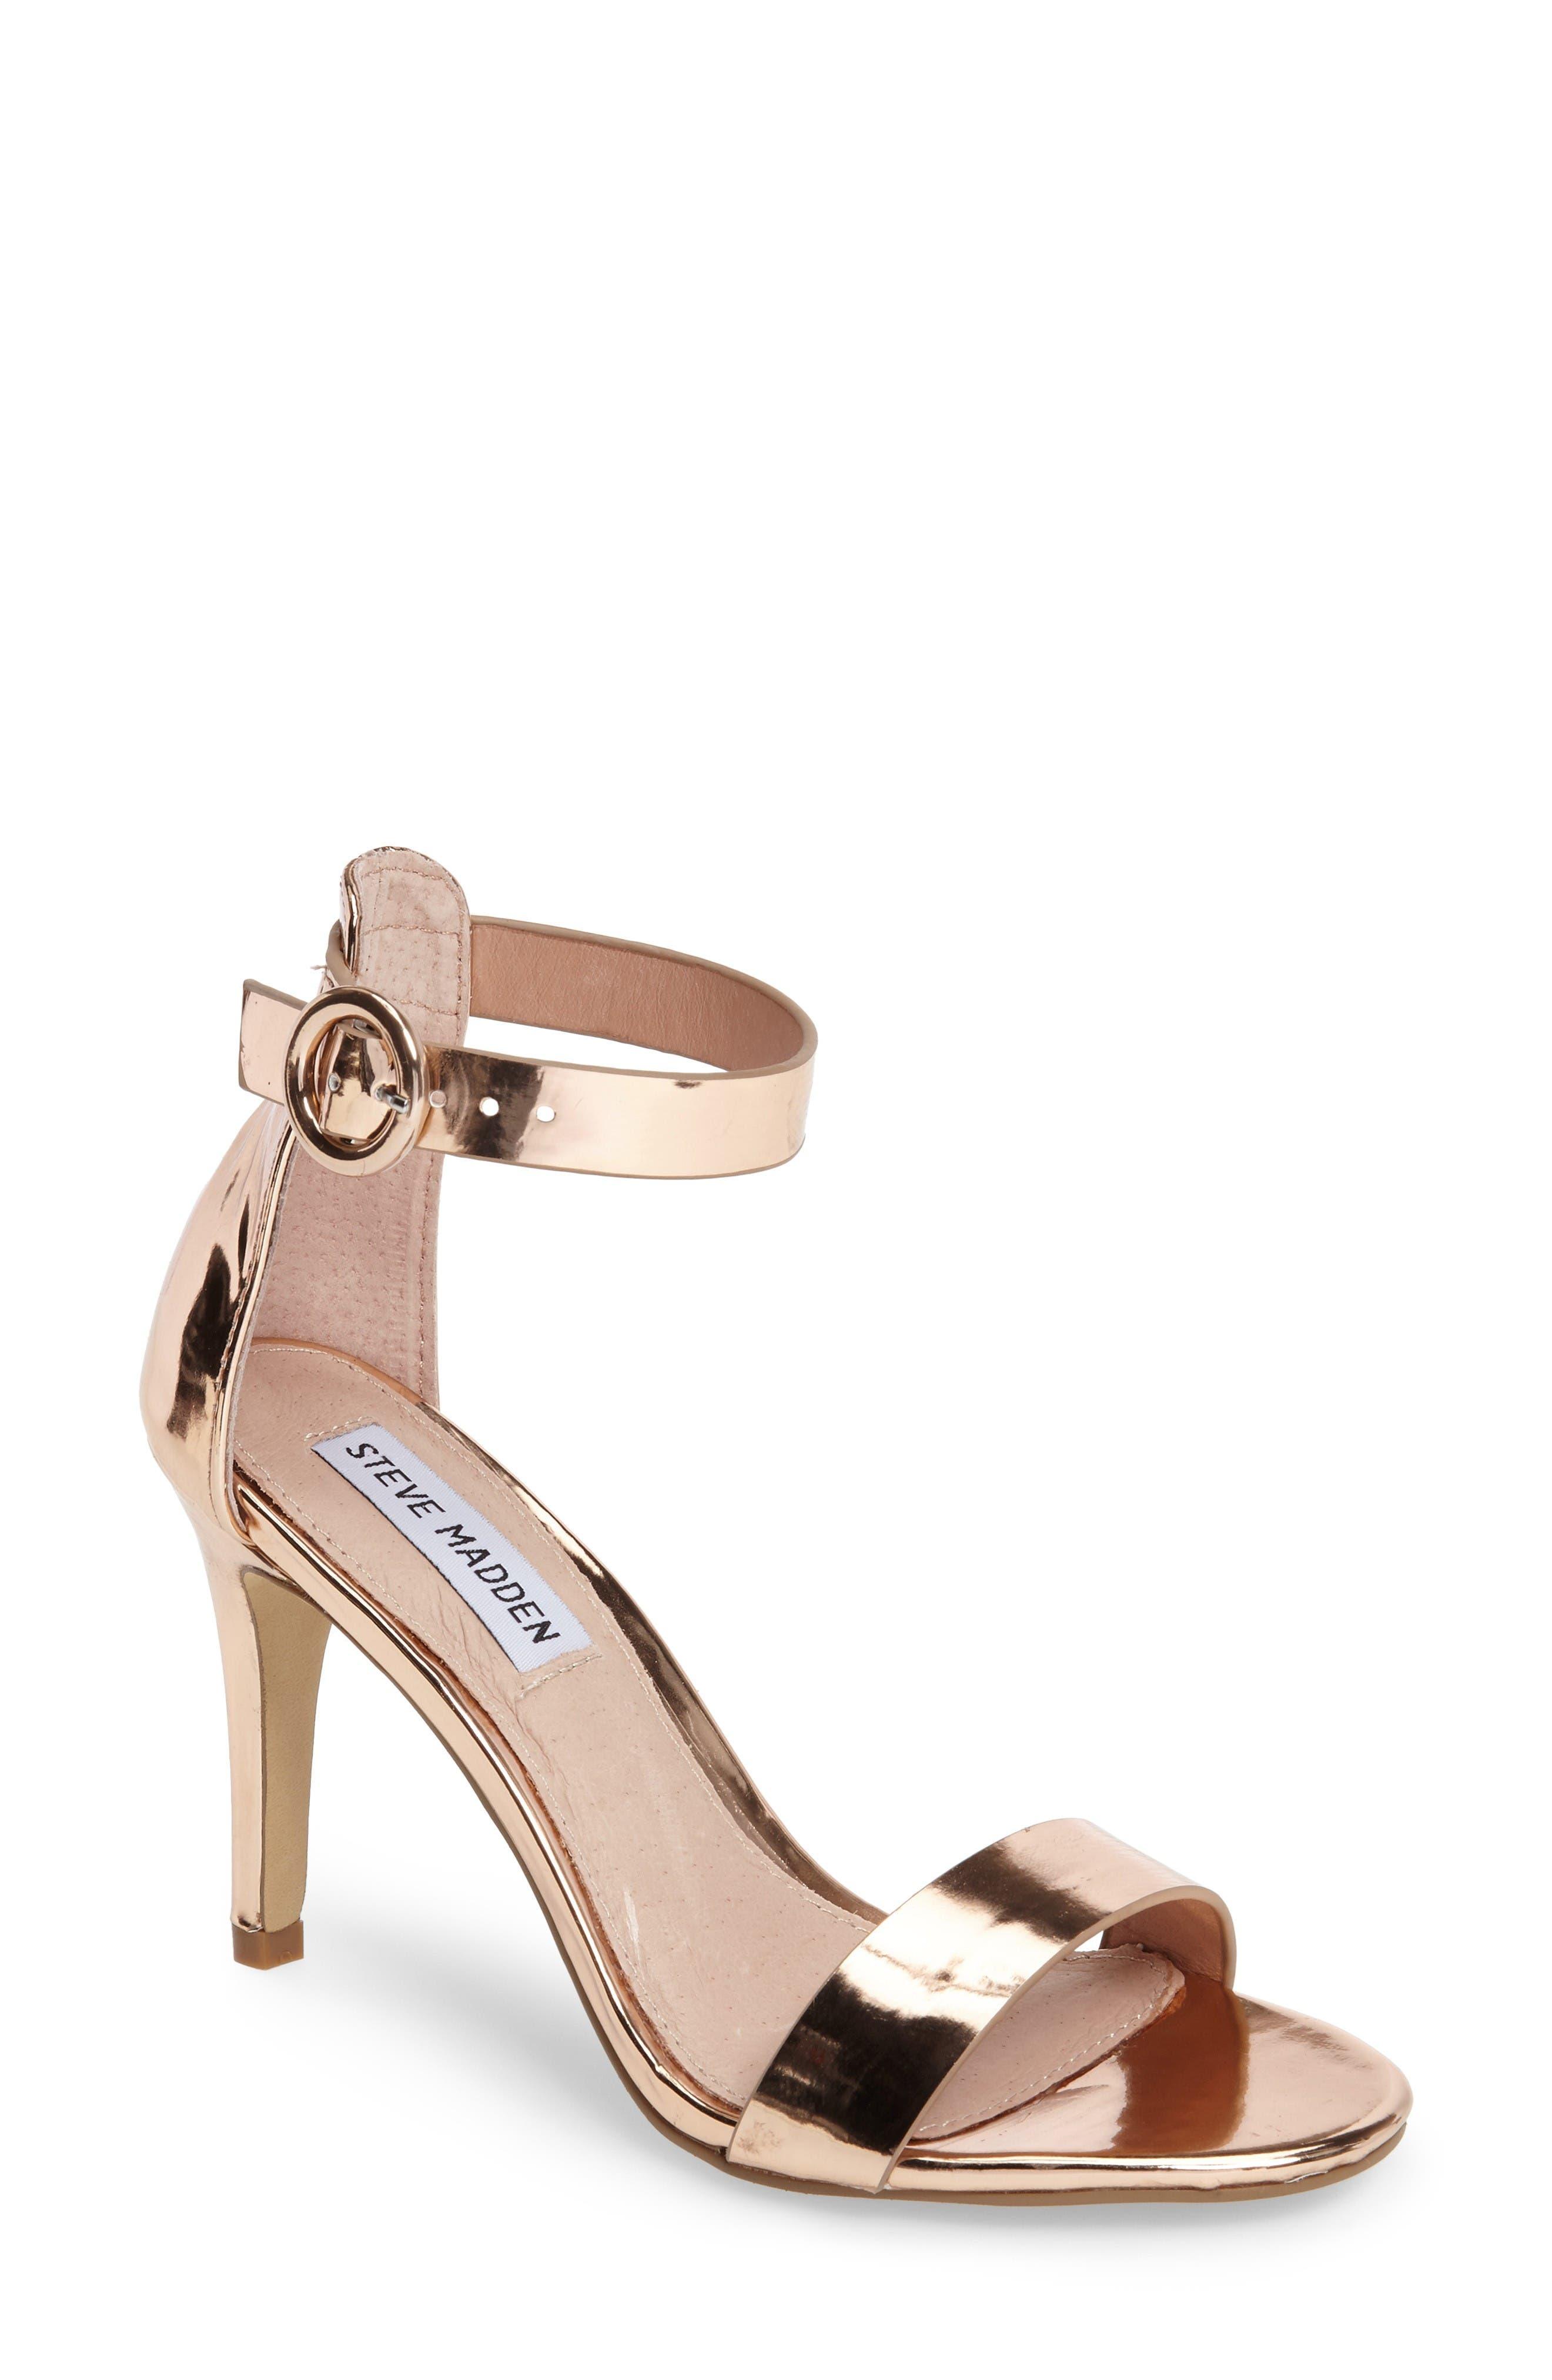 Born Sandal,                         Main,                         color, Rose Gold Faux Leather